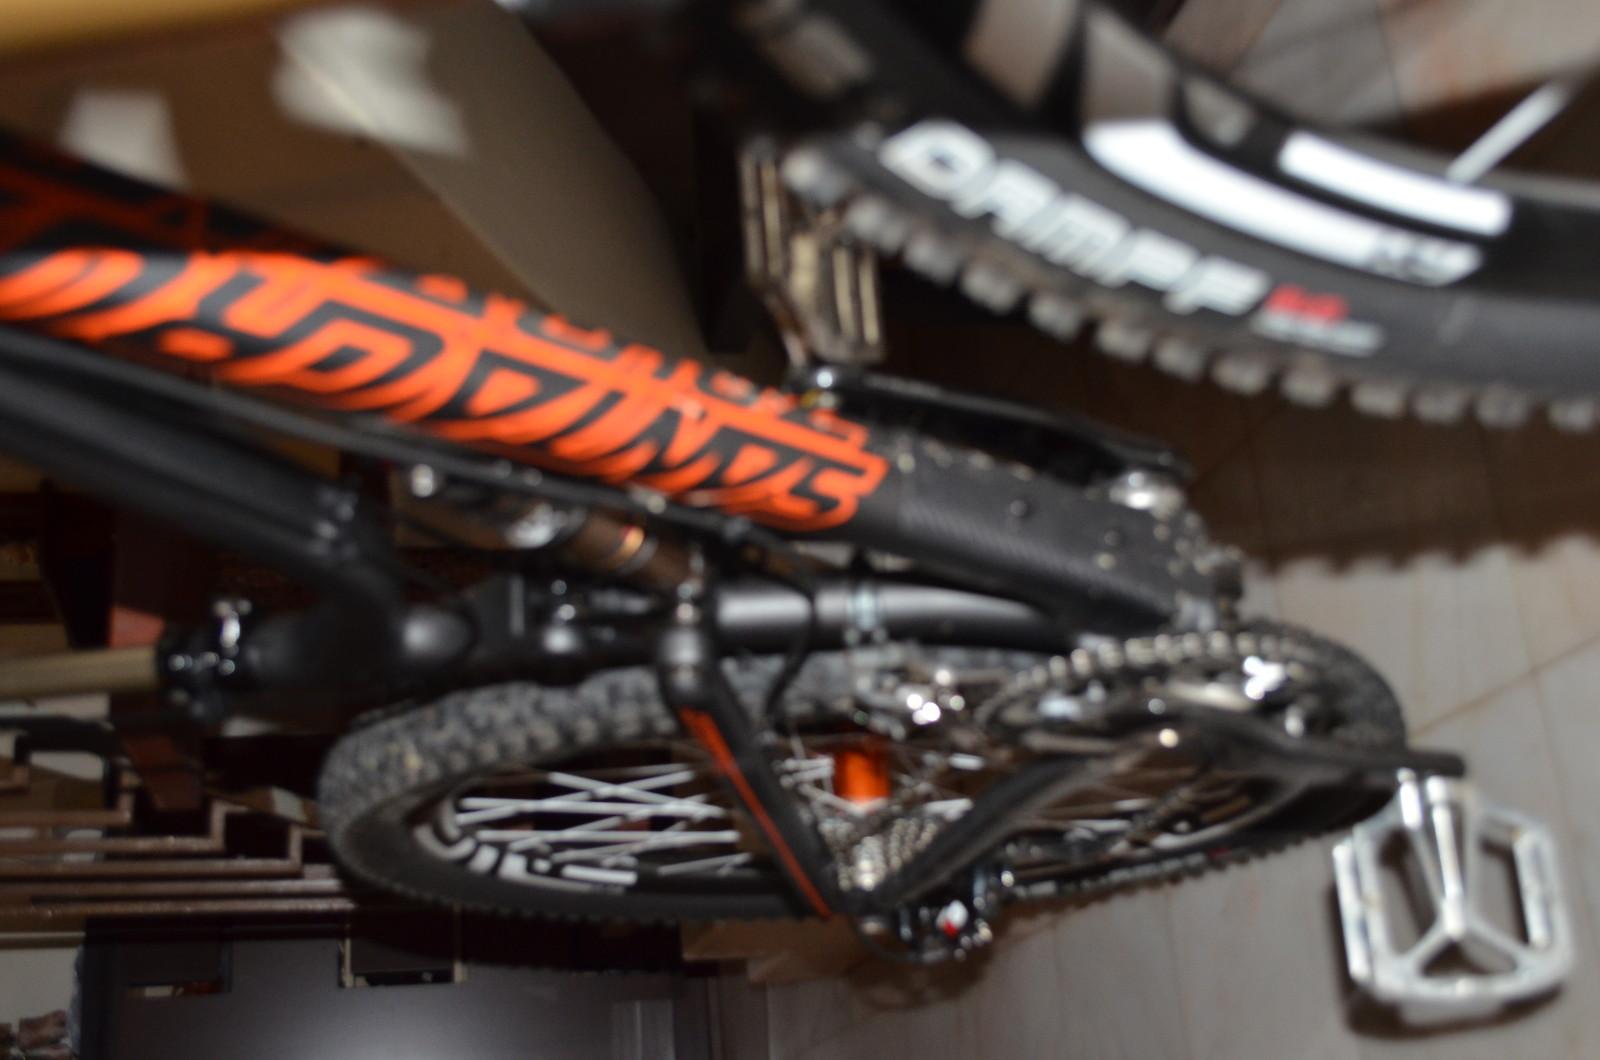 DSC 4572 - kenneth.jonathan.perkins.jr - Mountain Biking Pictures - Vital MTB